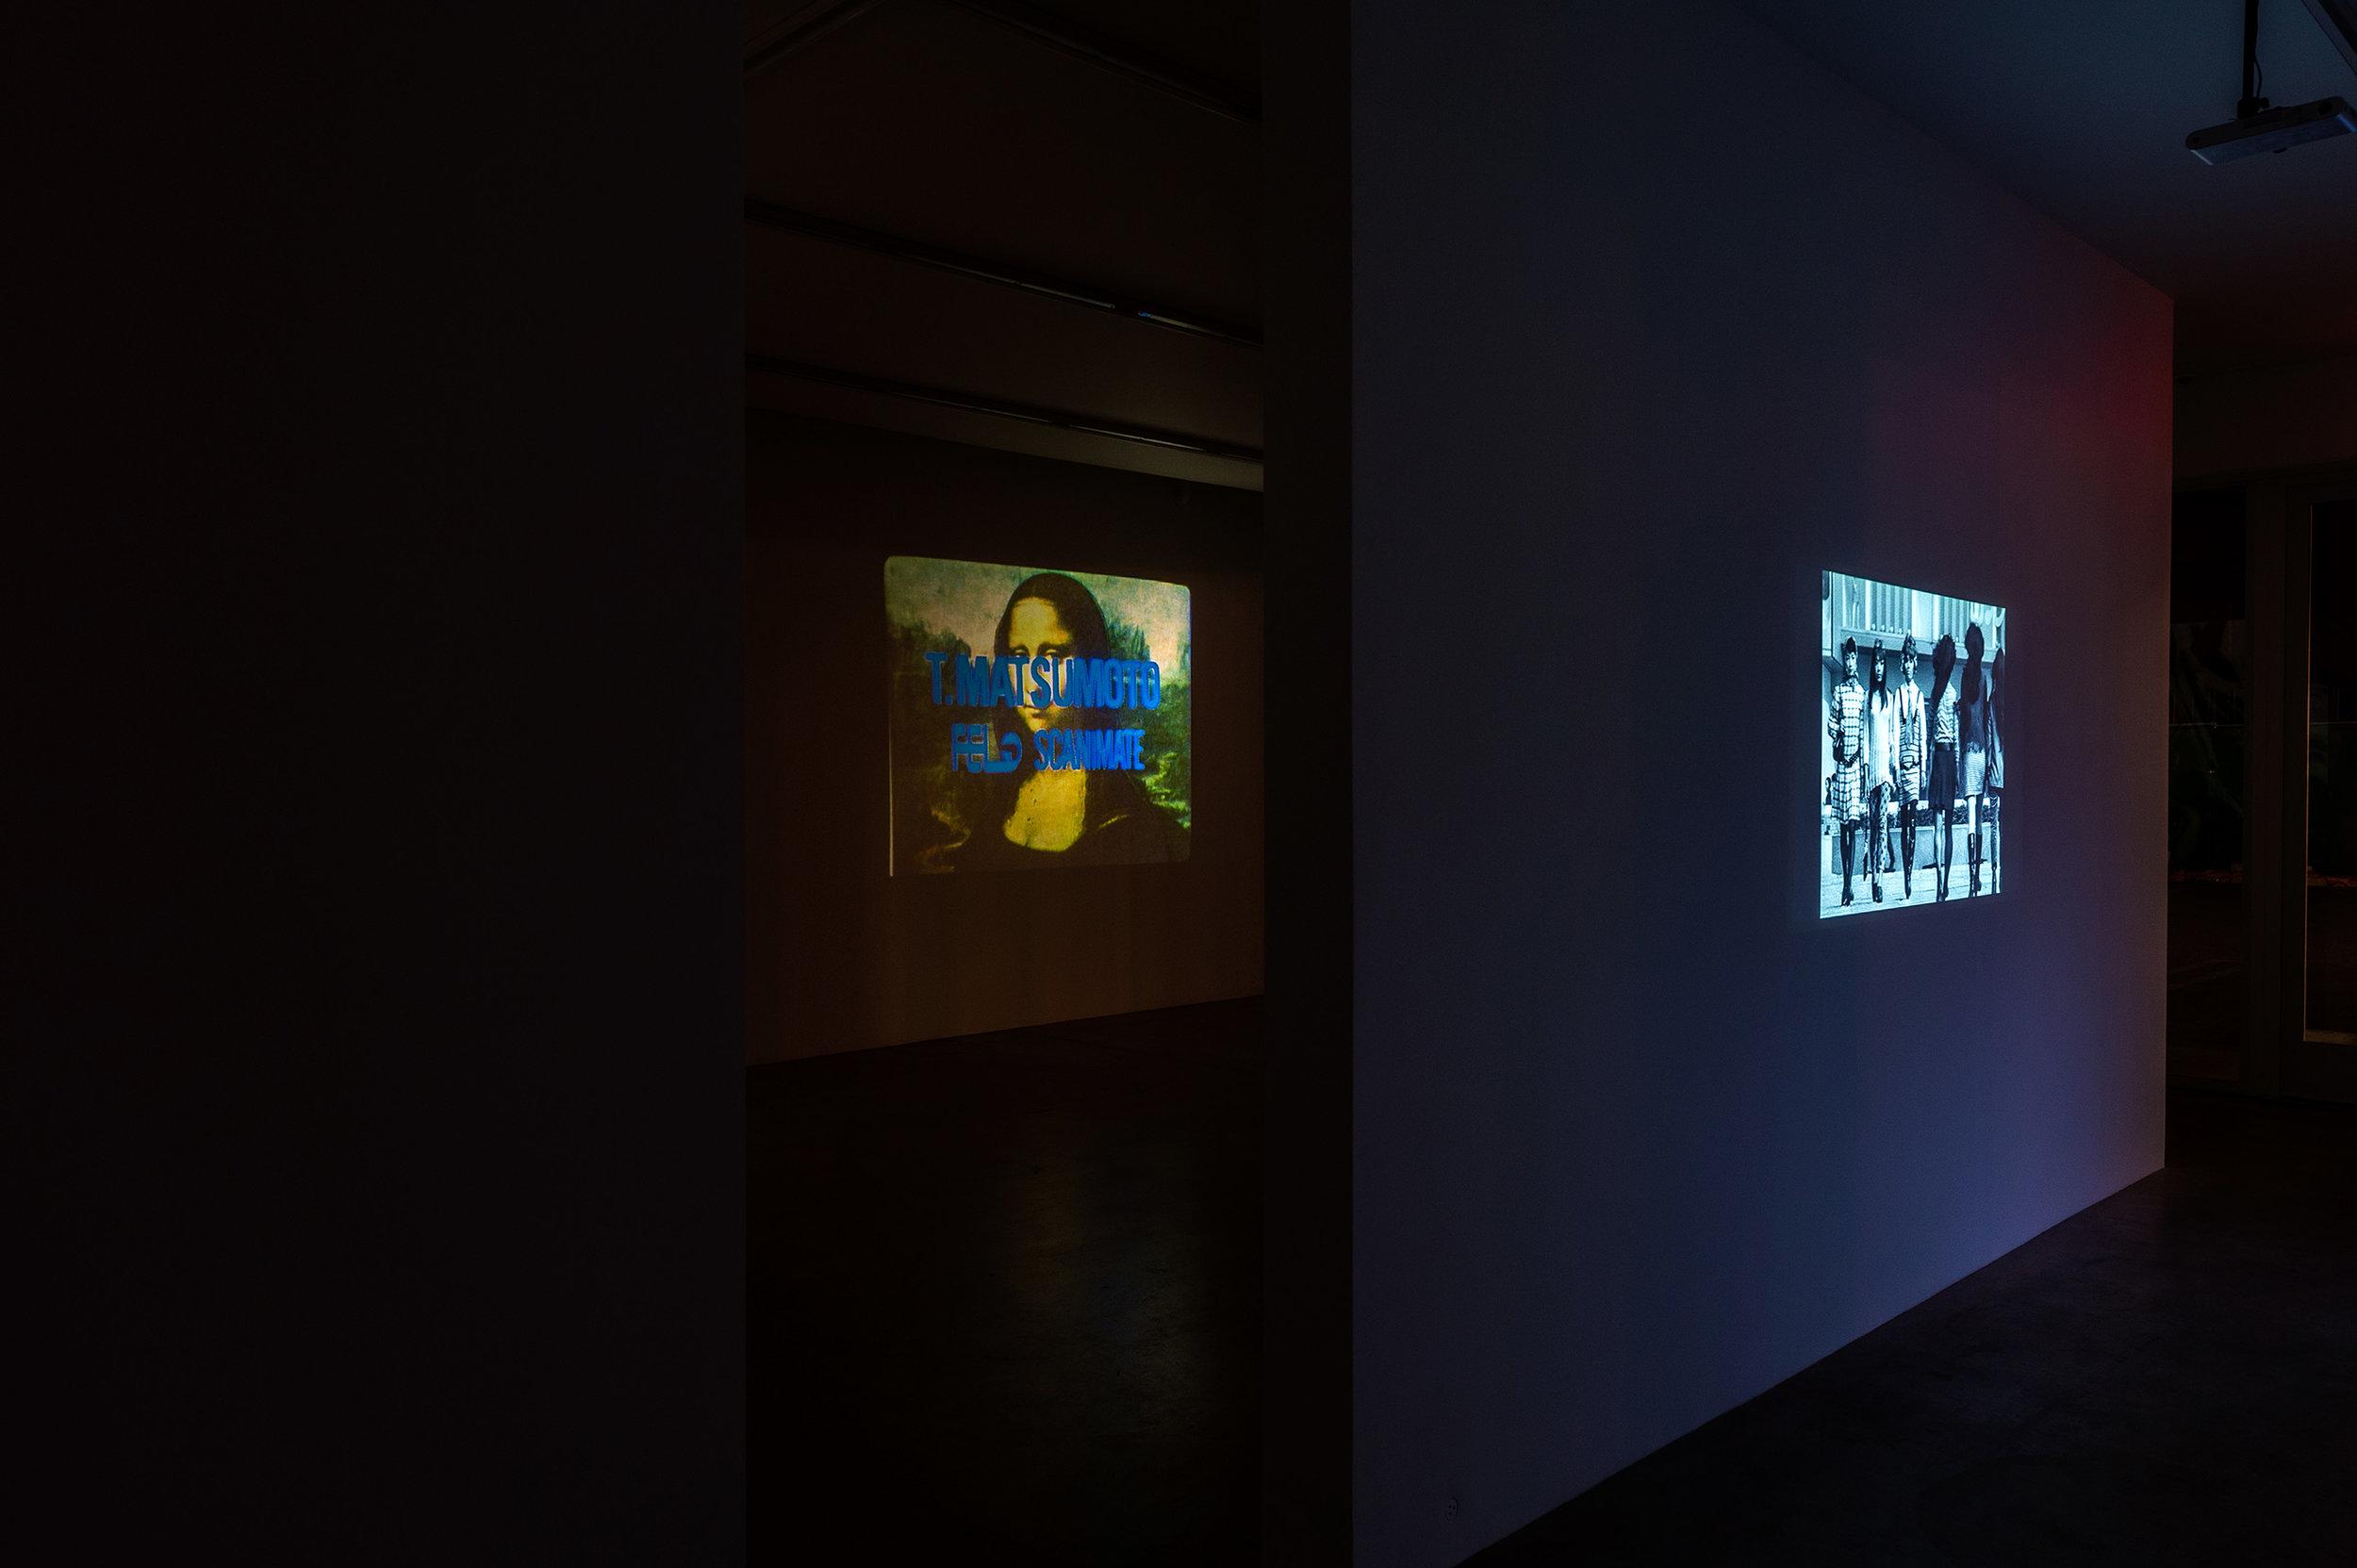 Left: Mona Lisa, 1973, 16mm, 3min Right: Funeral Parade of Roses, 1969, 105 min